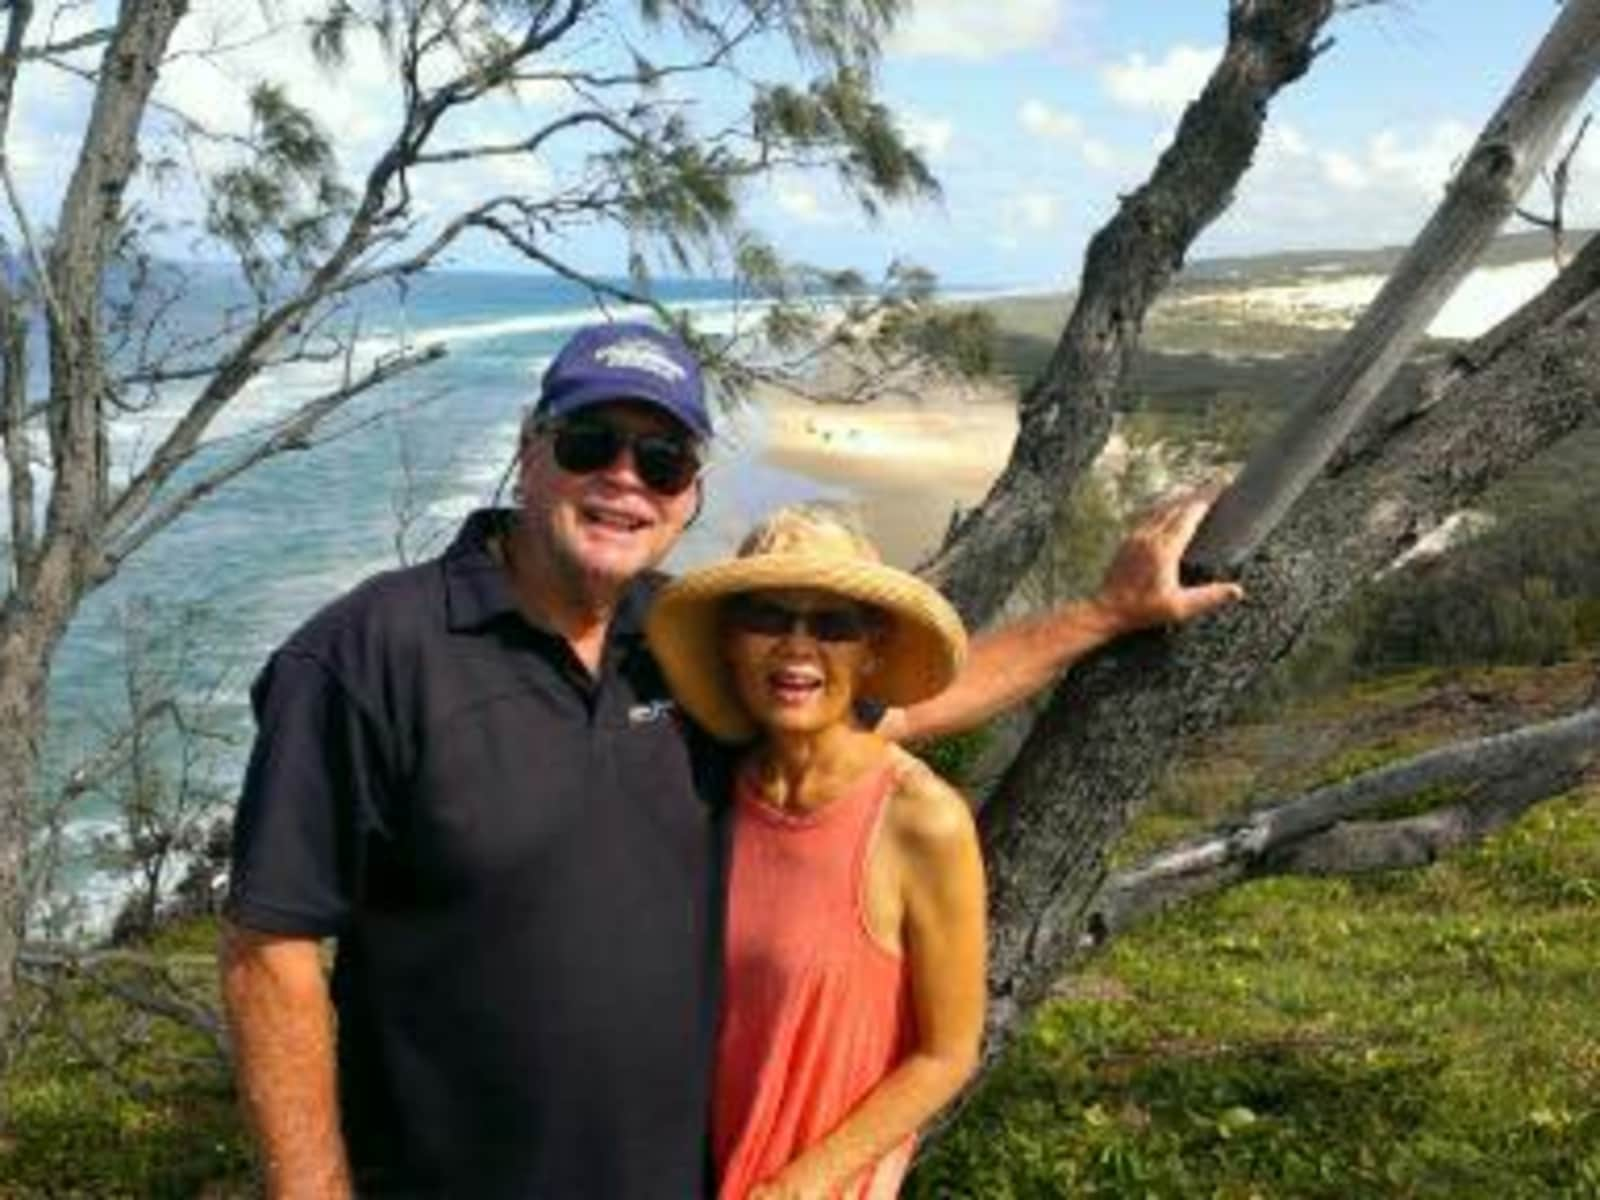 Peter & Flavia from Perth, Western Australia, Australia